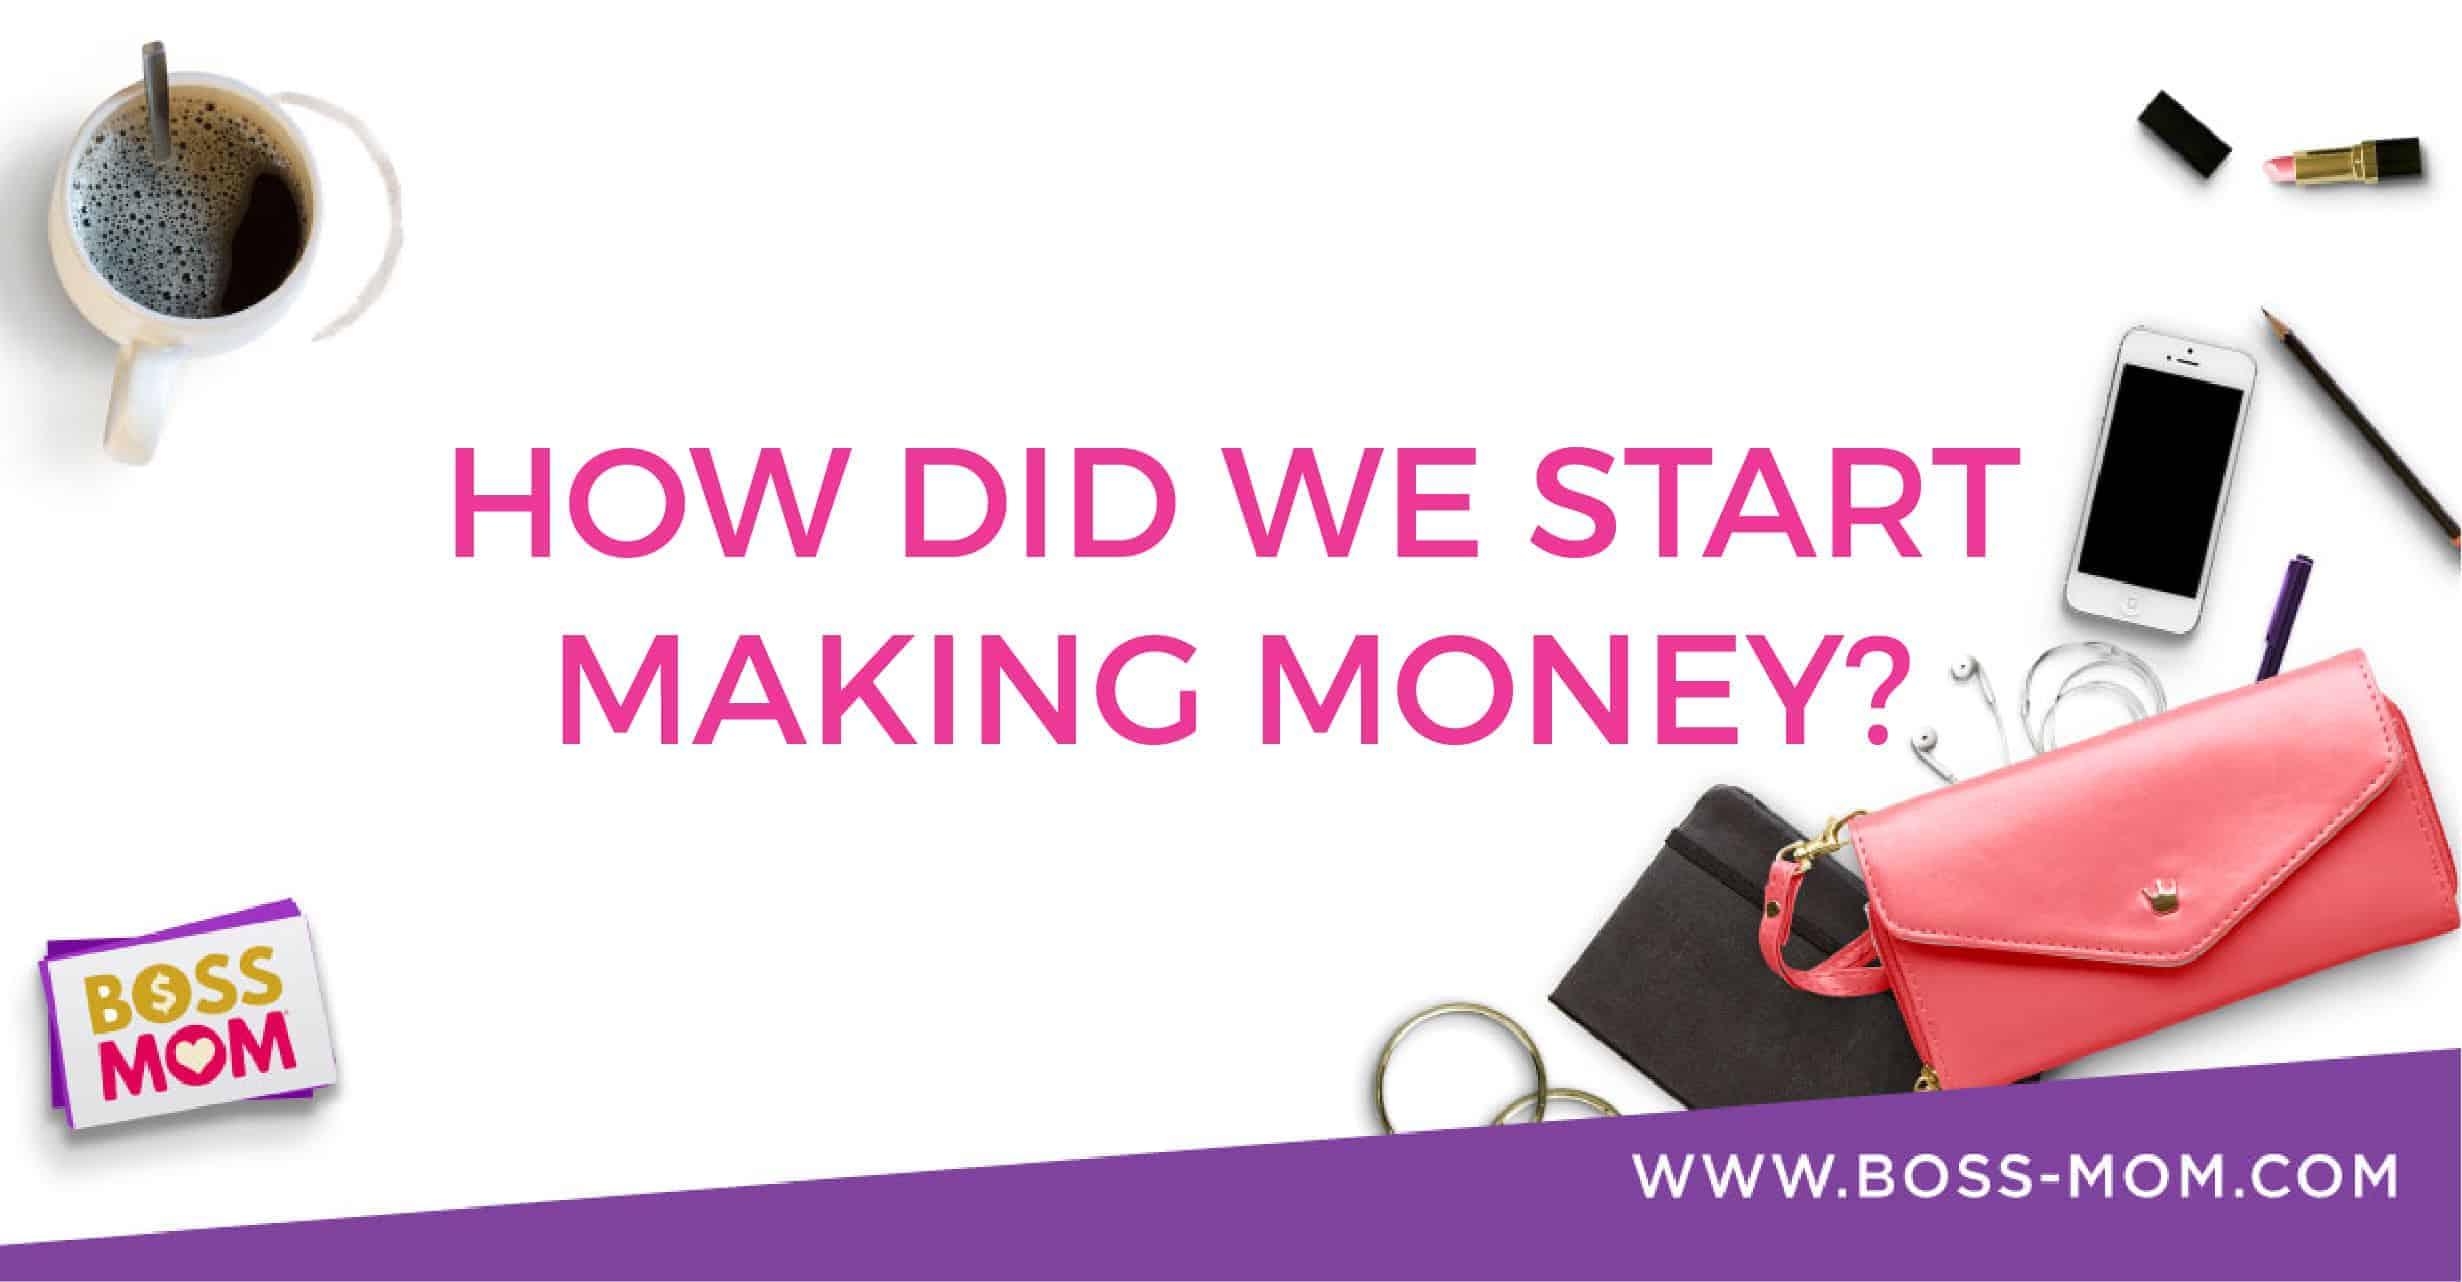 Episode 203: How Did We Start Making Money with Dana & NJ